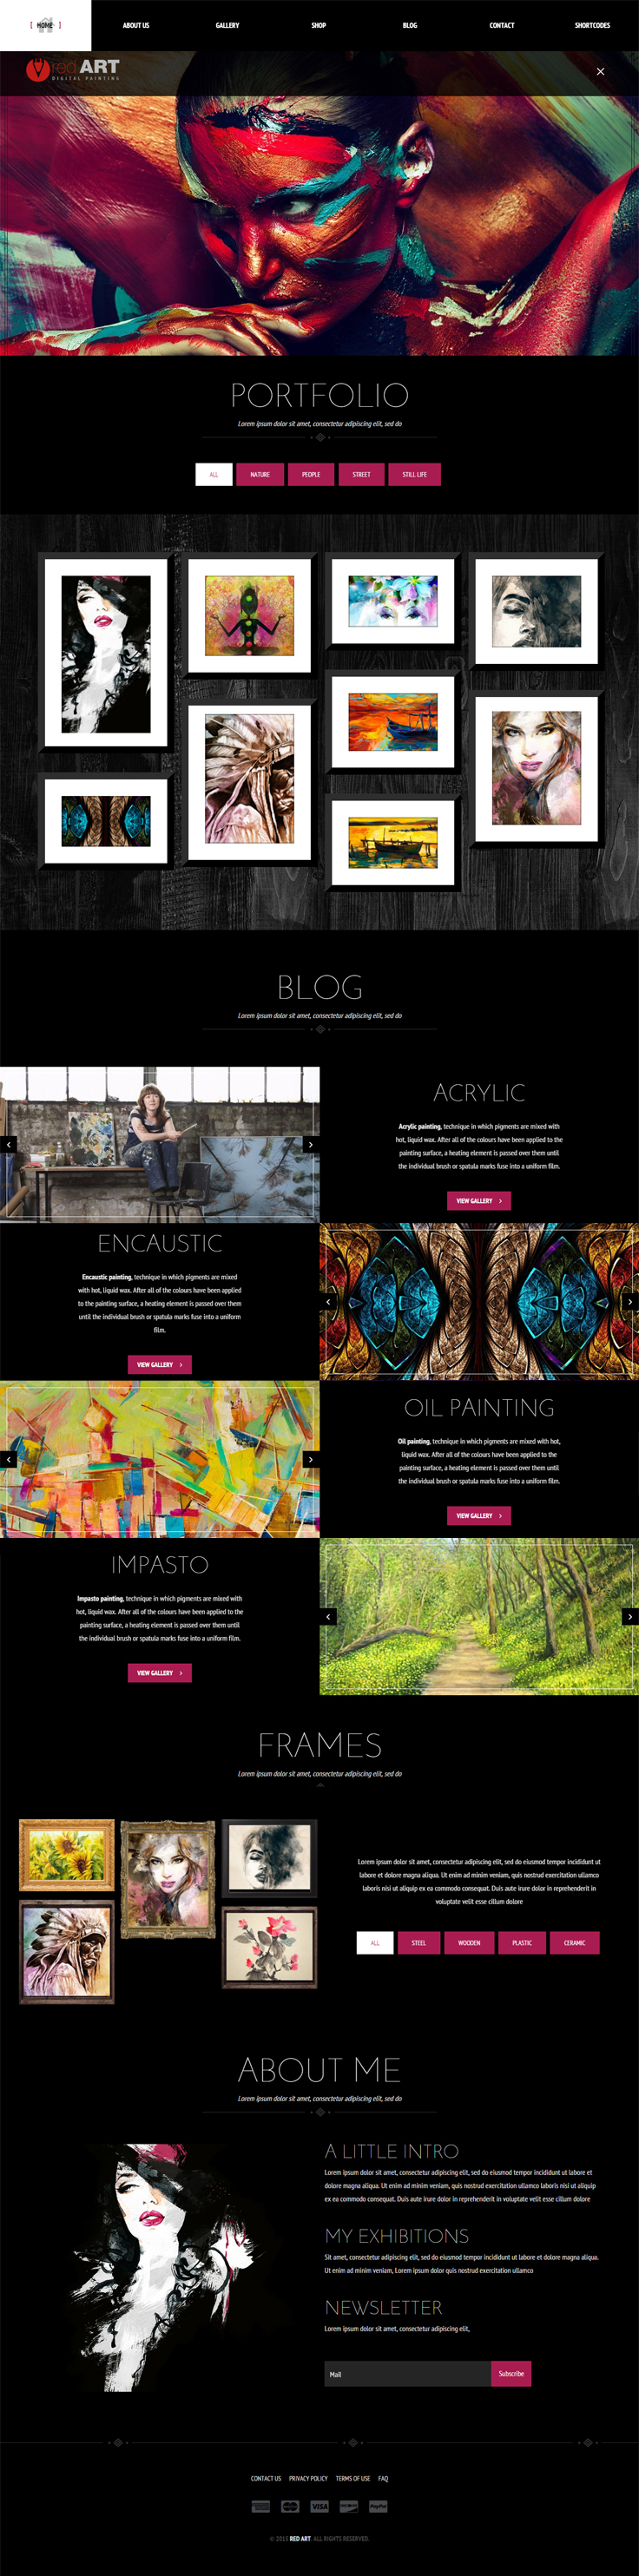 Red Art Is Creative Website Template Best Suited For Art Gallery - Art gallery website templates